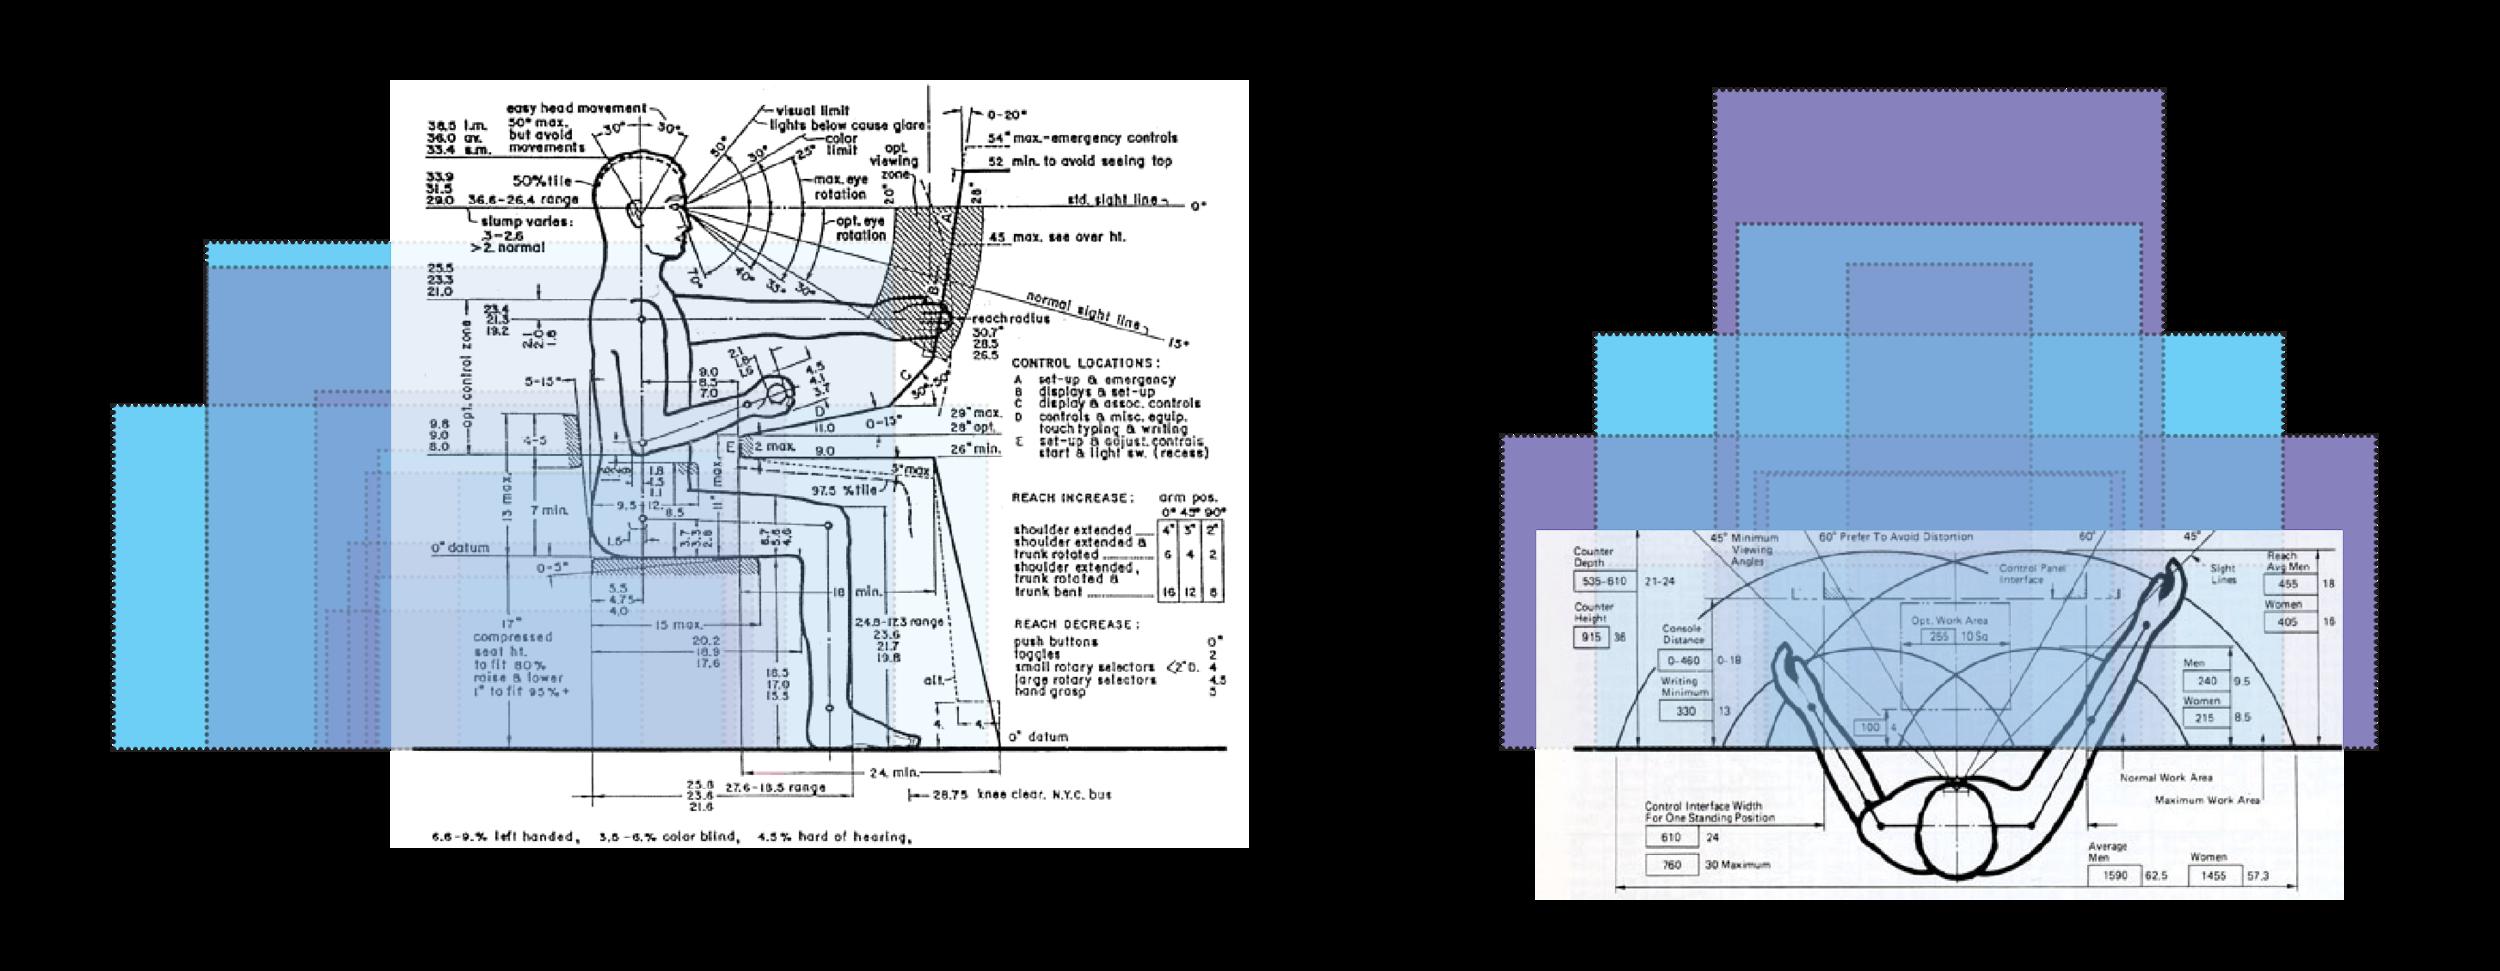 180528 Website Diagrams-03.png